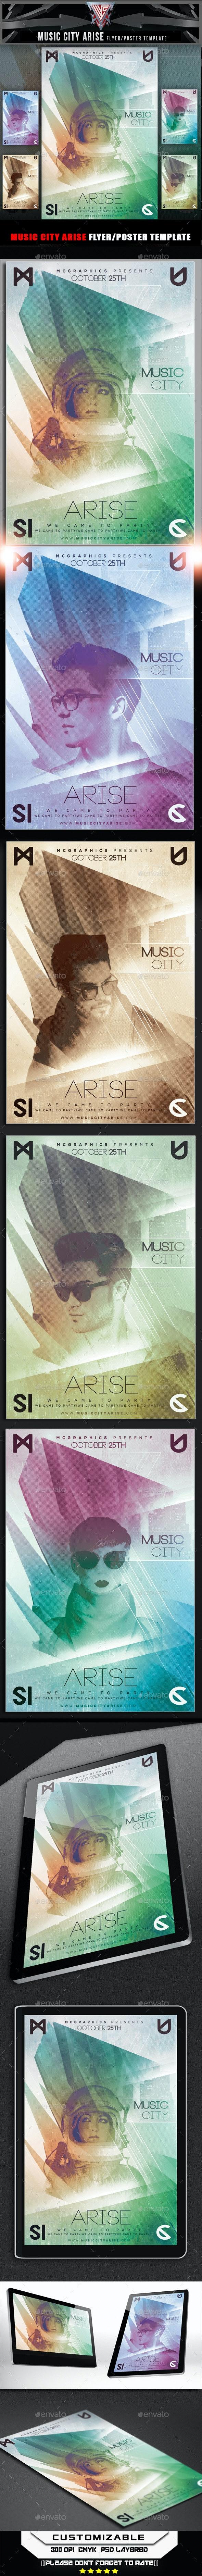 Music City Arise Flyer Template - Flyers Print Templates